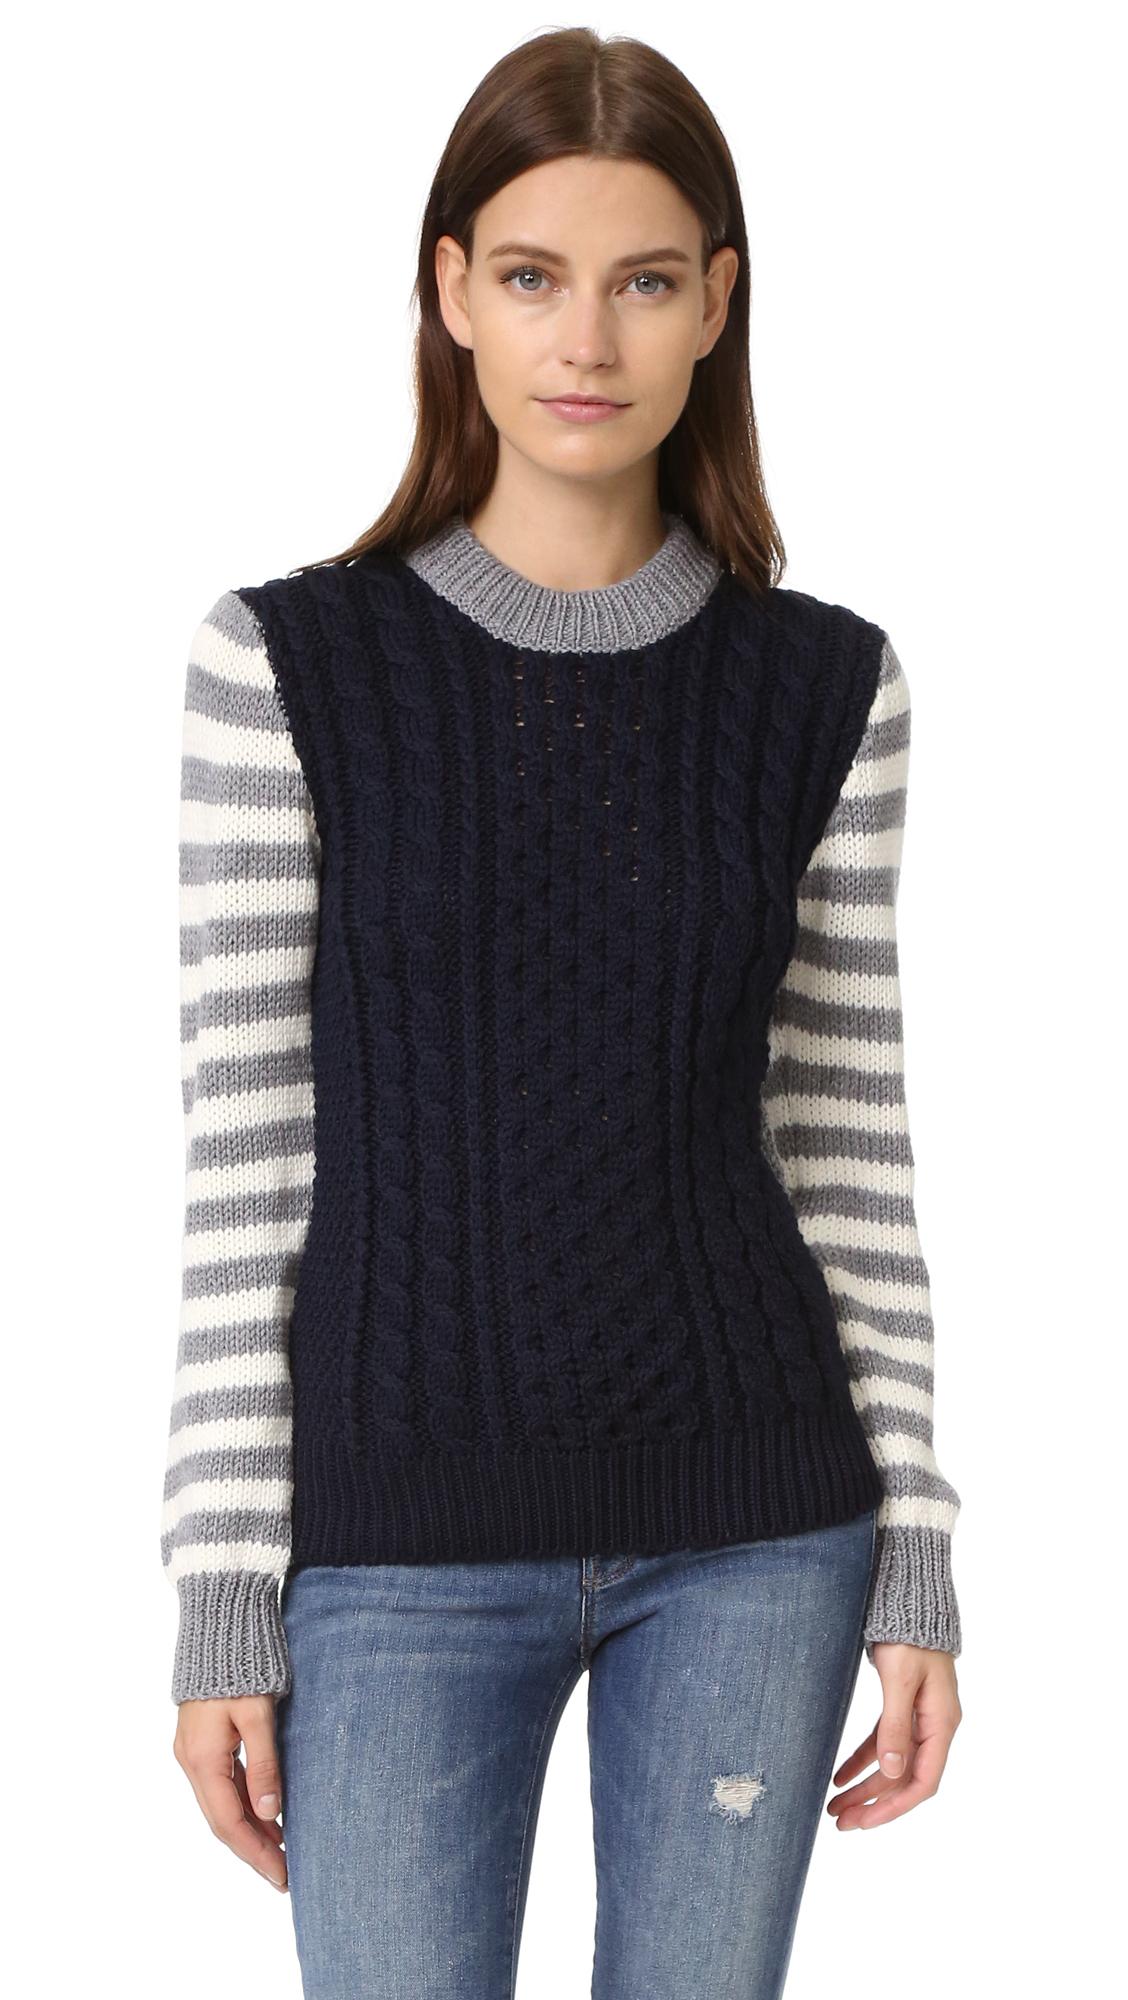 &Daughter Stripe Sleeve Aran Sweater - Navy/Grey at Shopbop